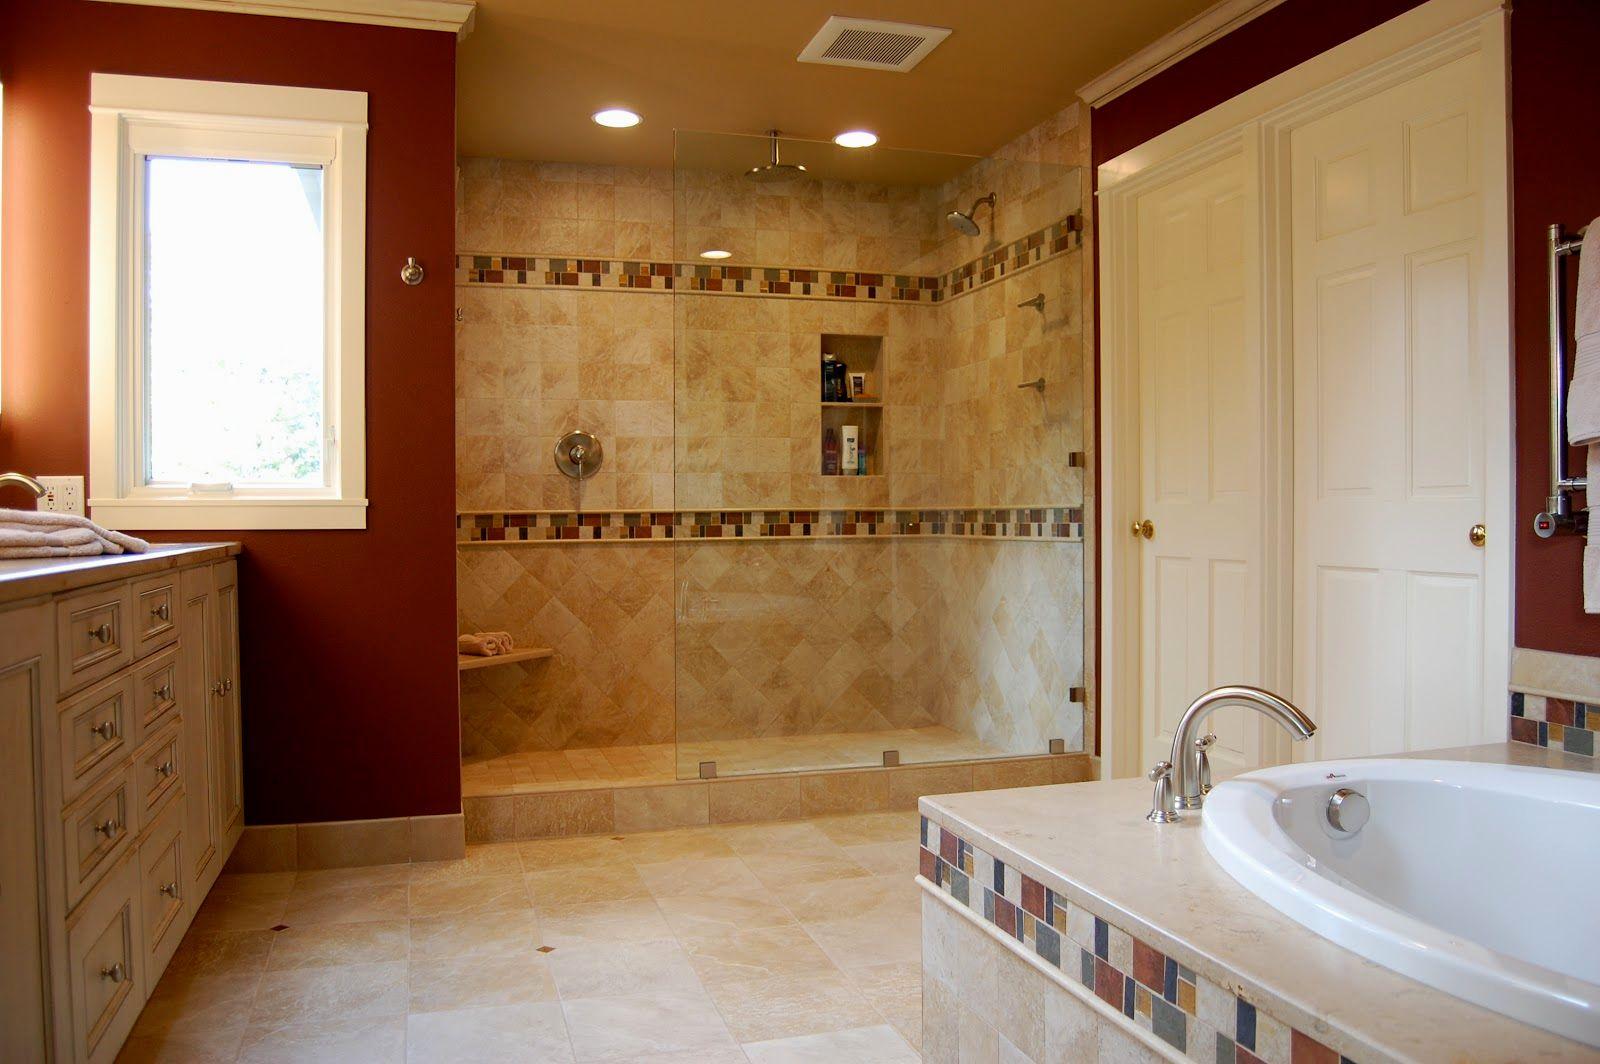 terrific bathroom remodel memphis image-Cool Bathroom Remodel Memphis Concept